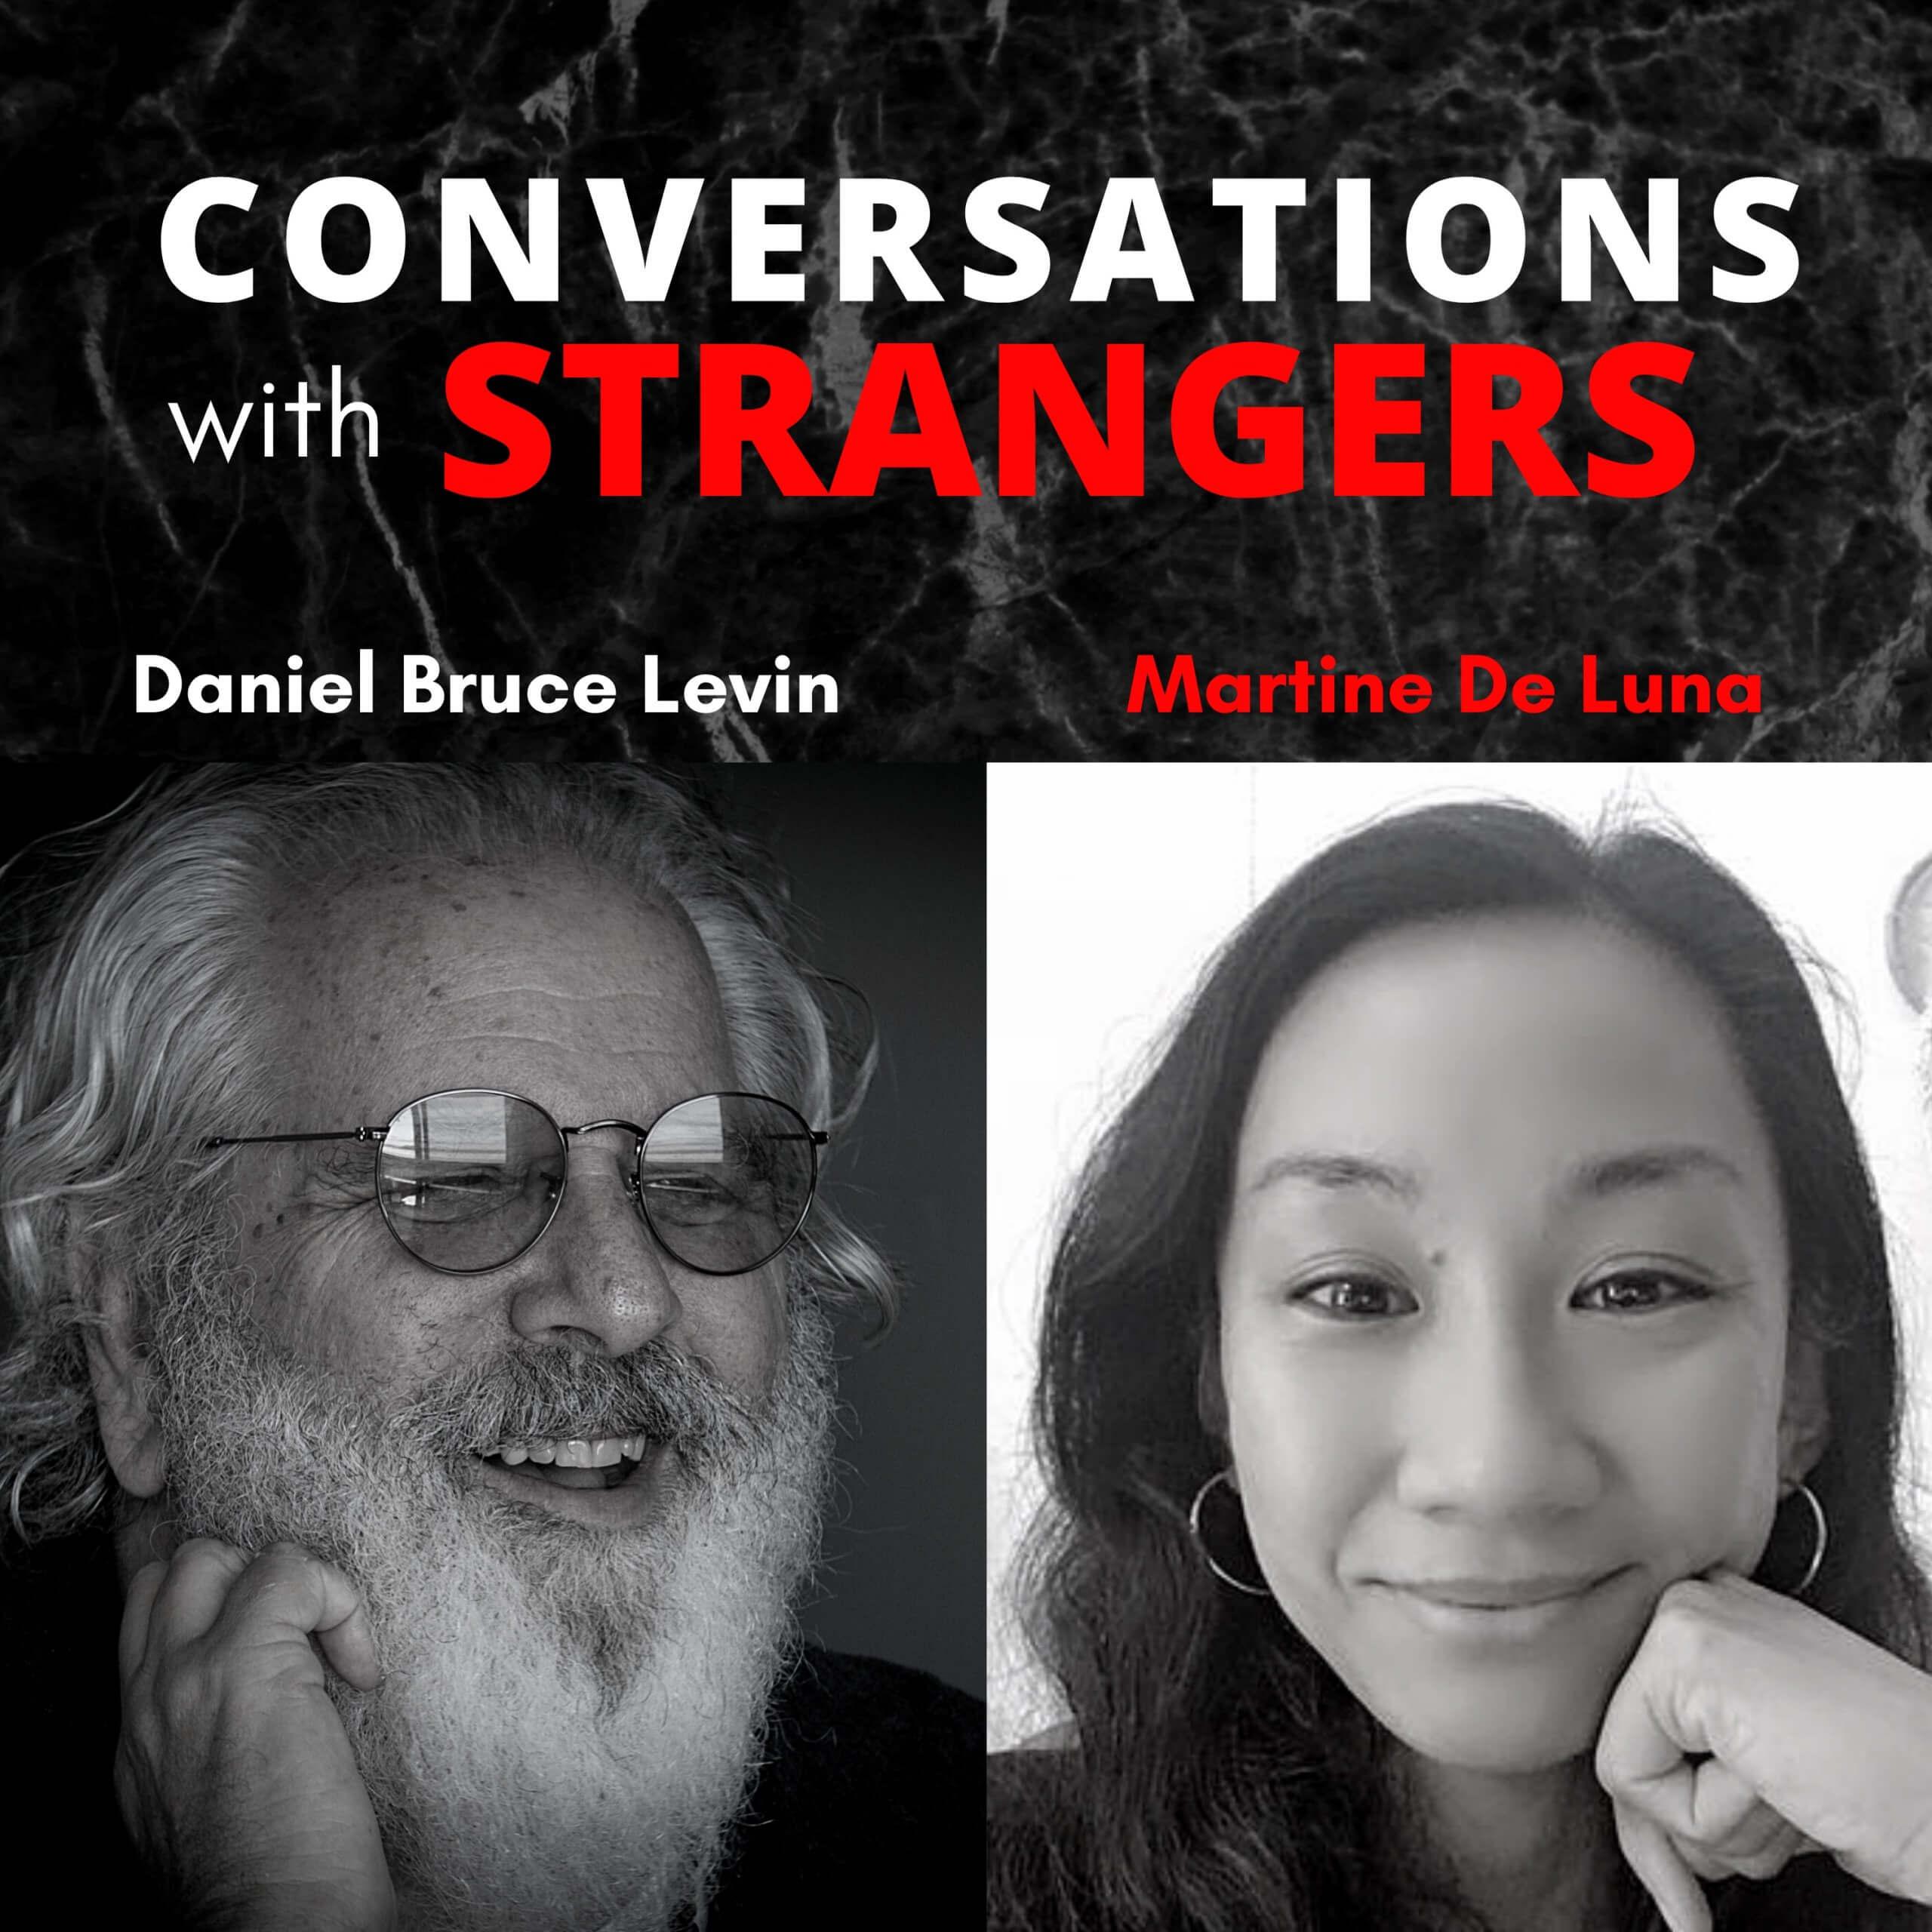 Conversations with Strangers feat. Martine De Luna